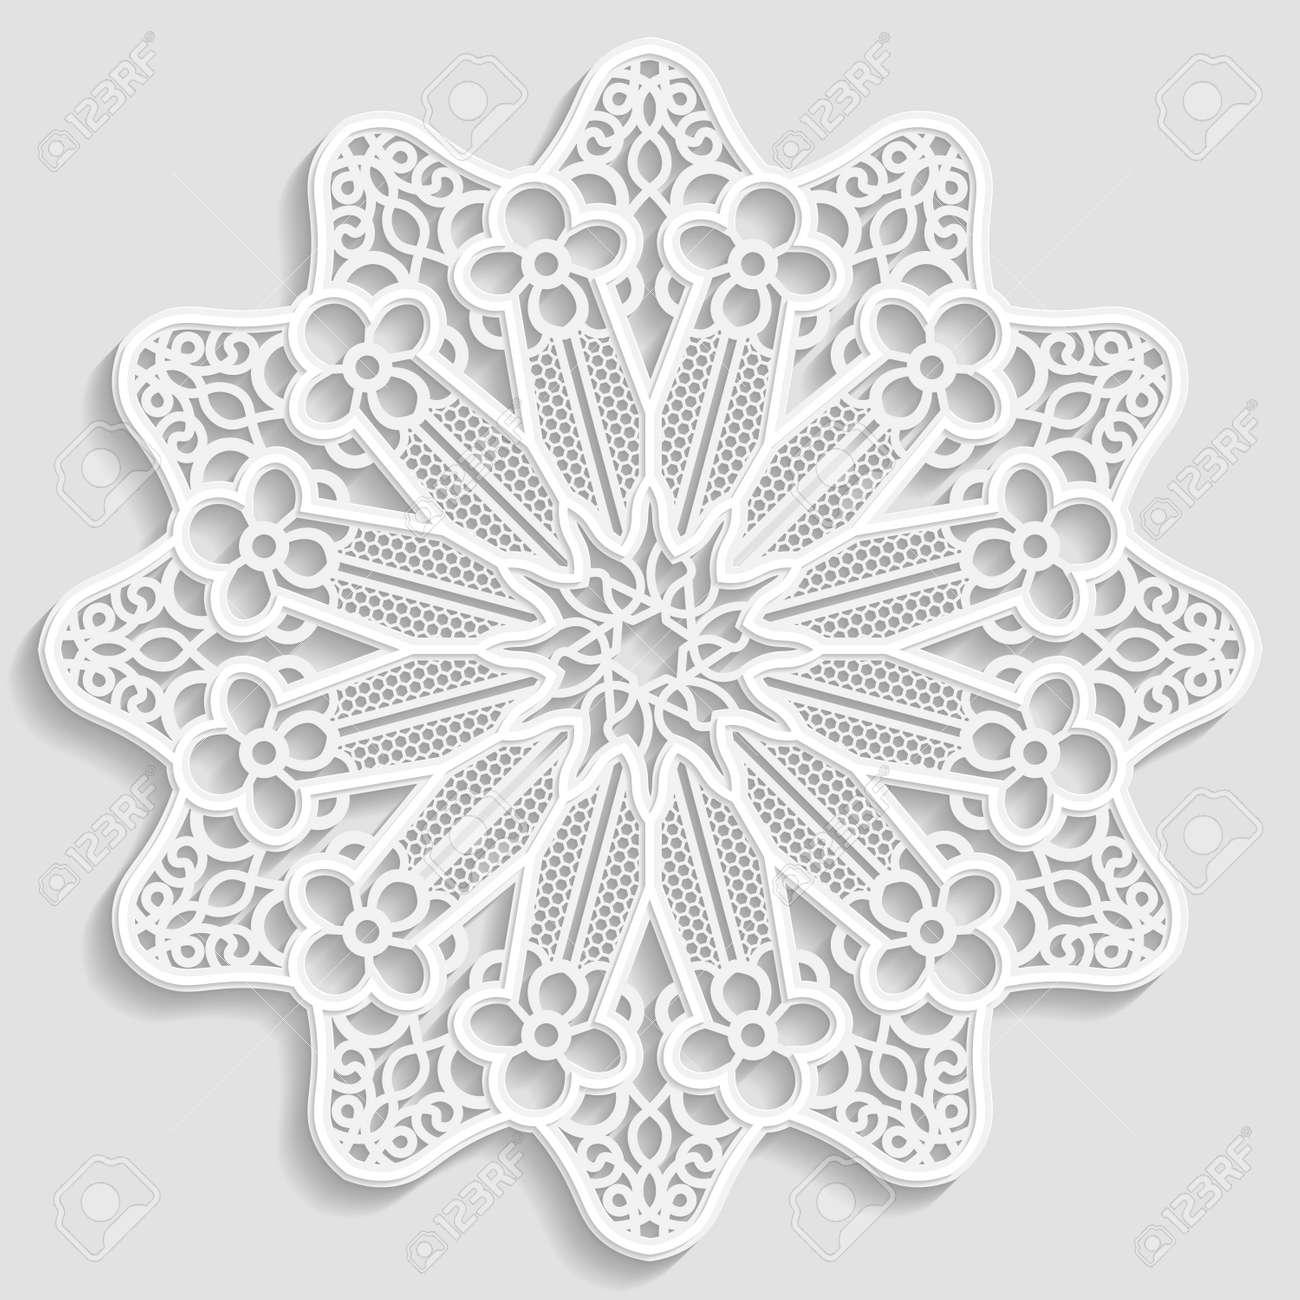 Lacy Pañito De Papel, Flor Decorativa, Copo De Nieve Decorativo ...